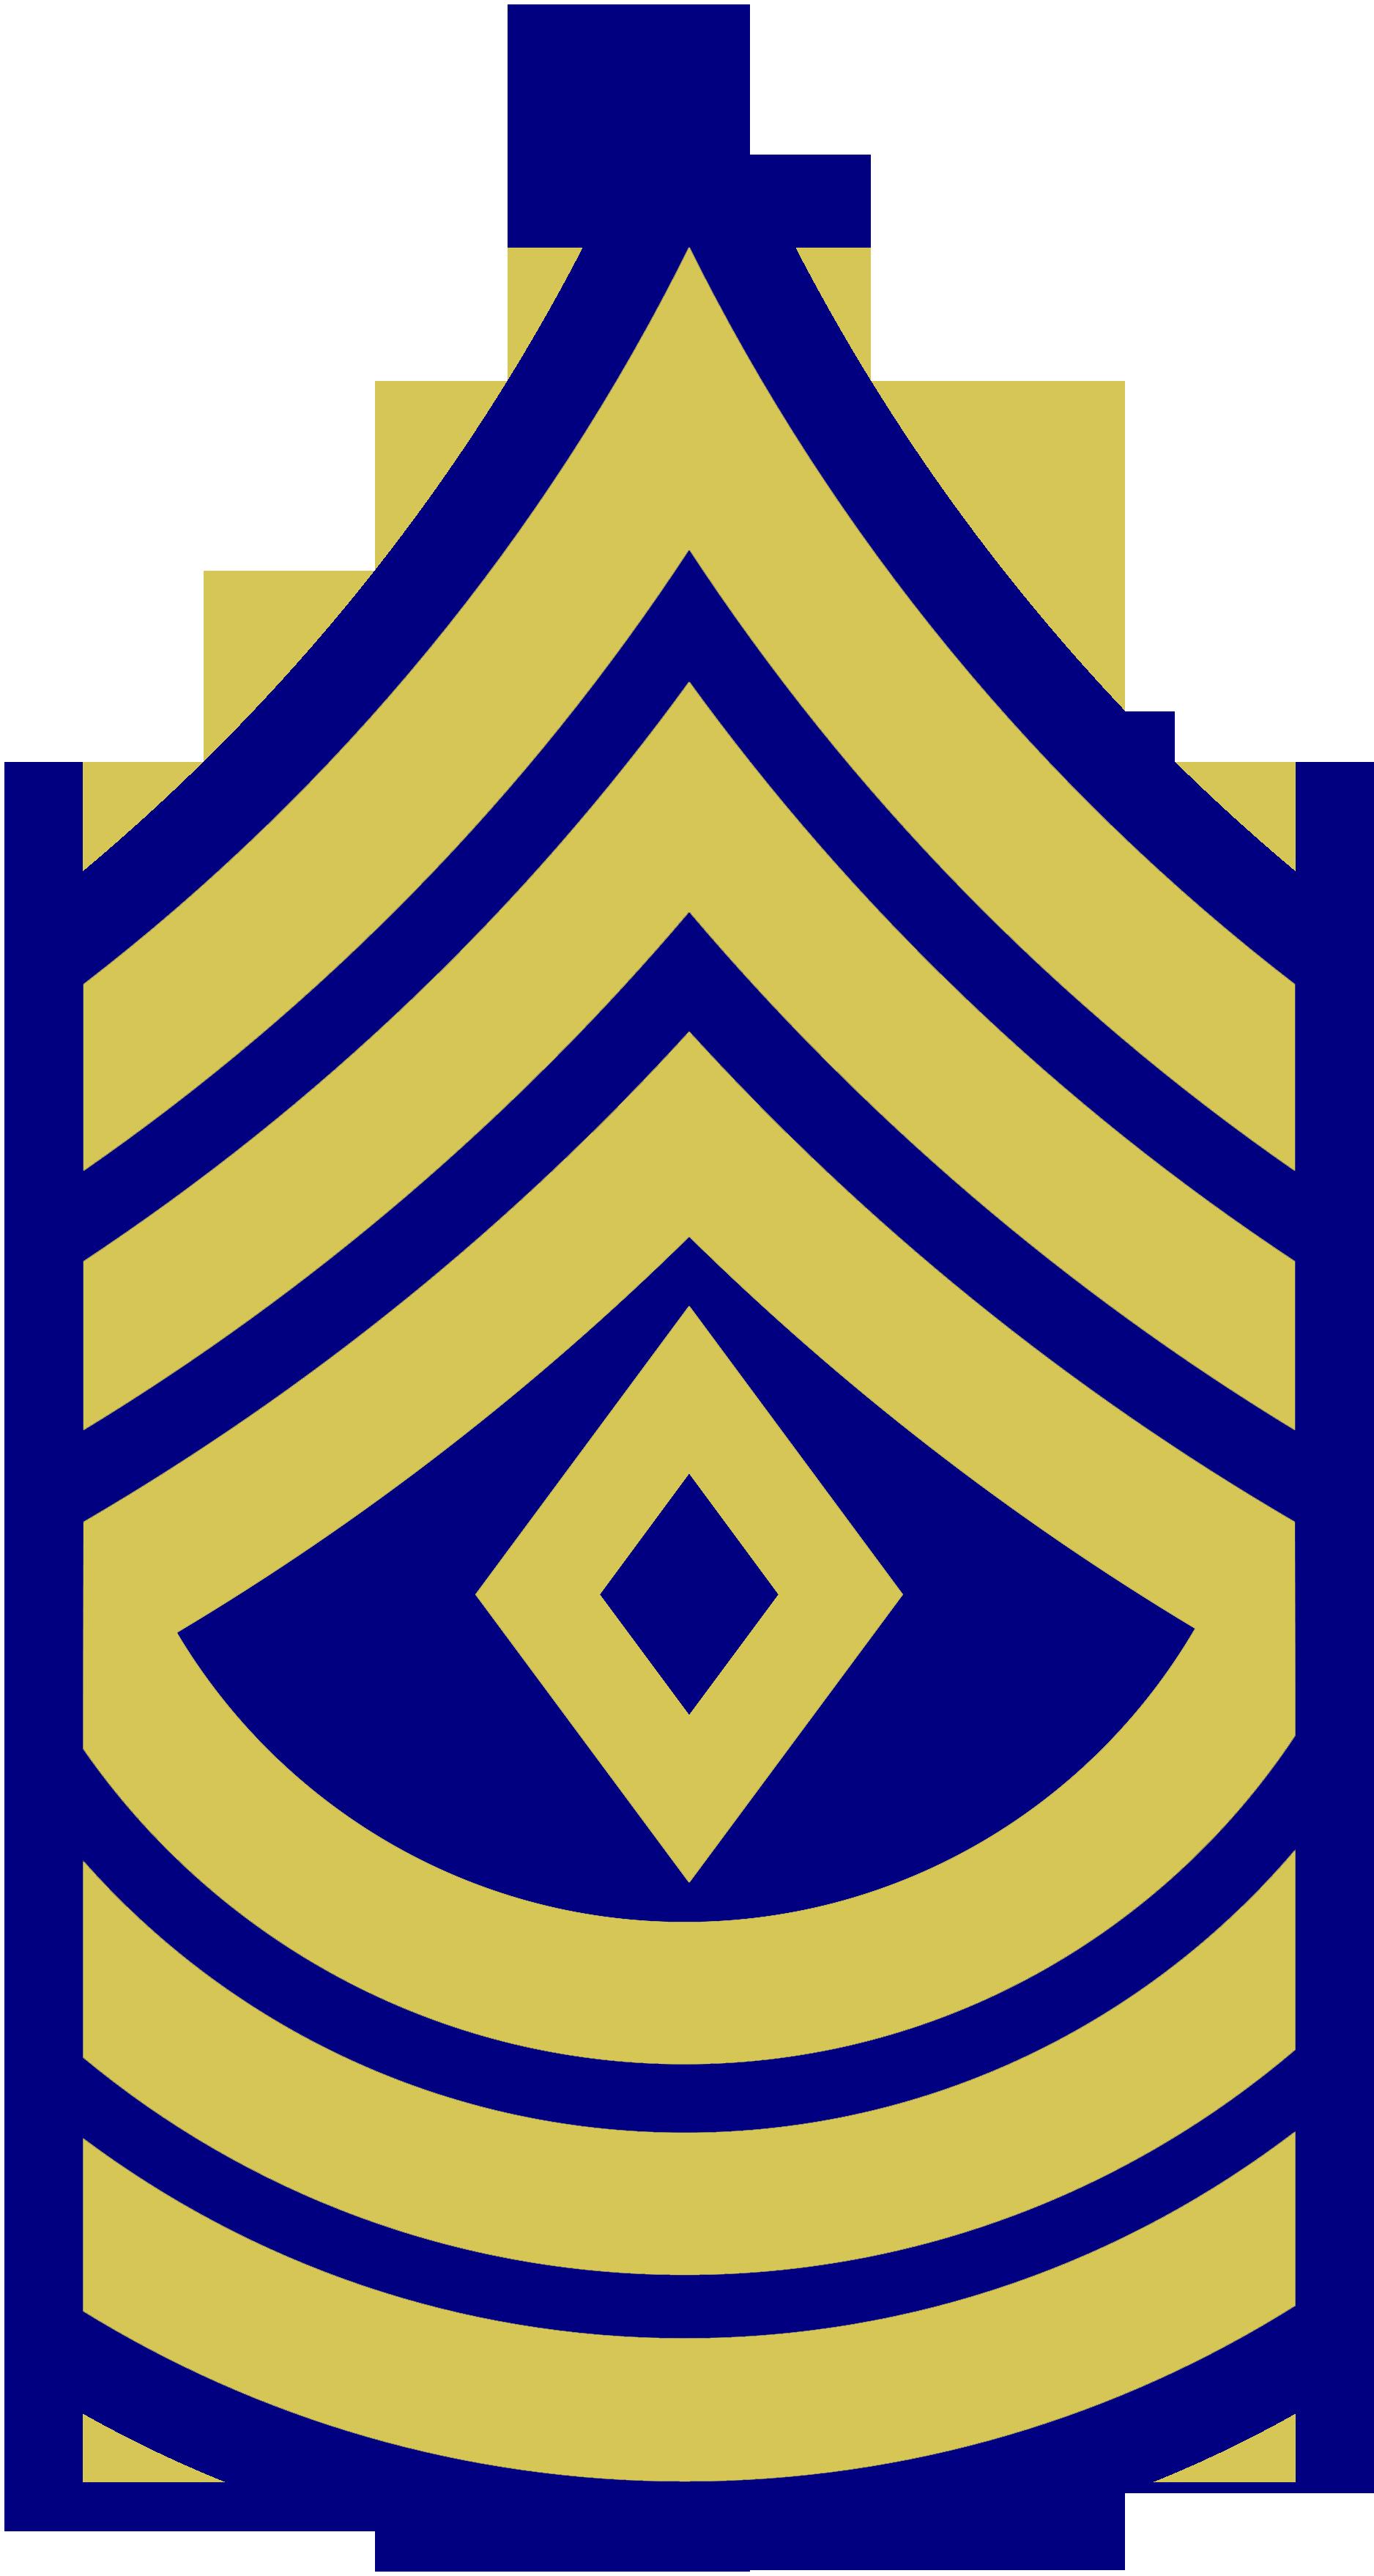 military insignia clipart - photo #6